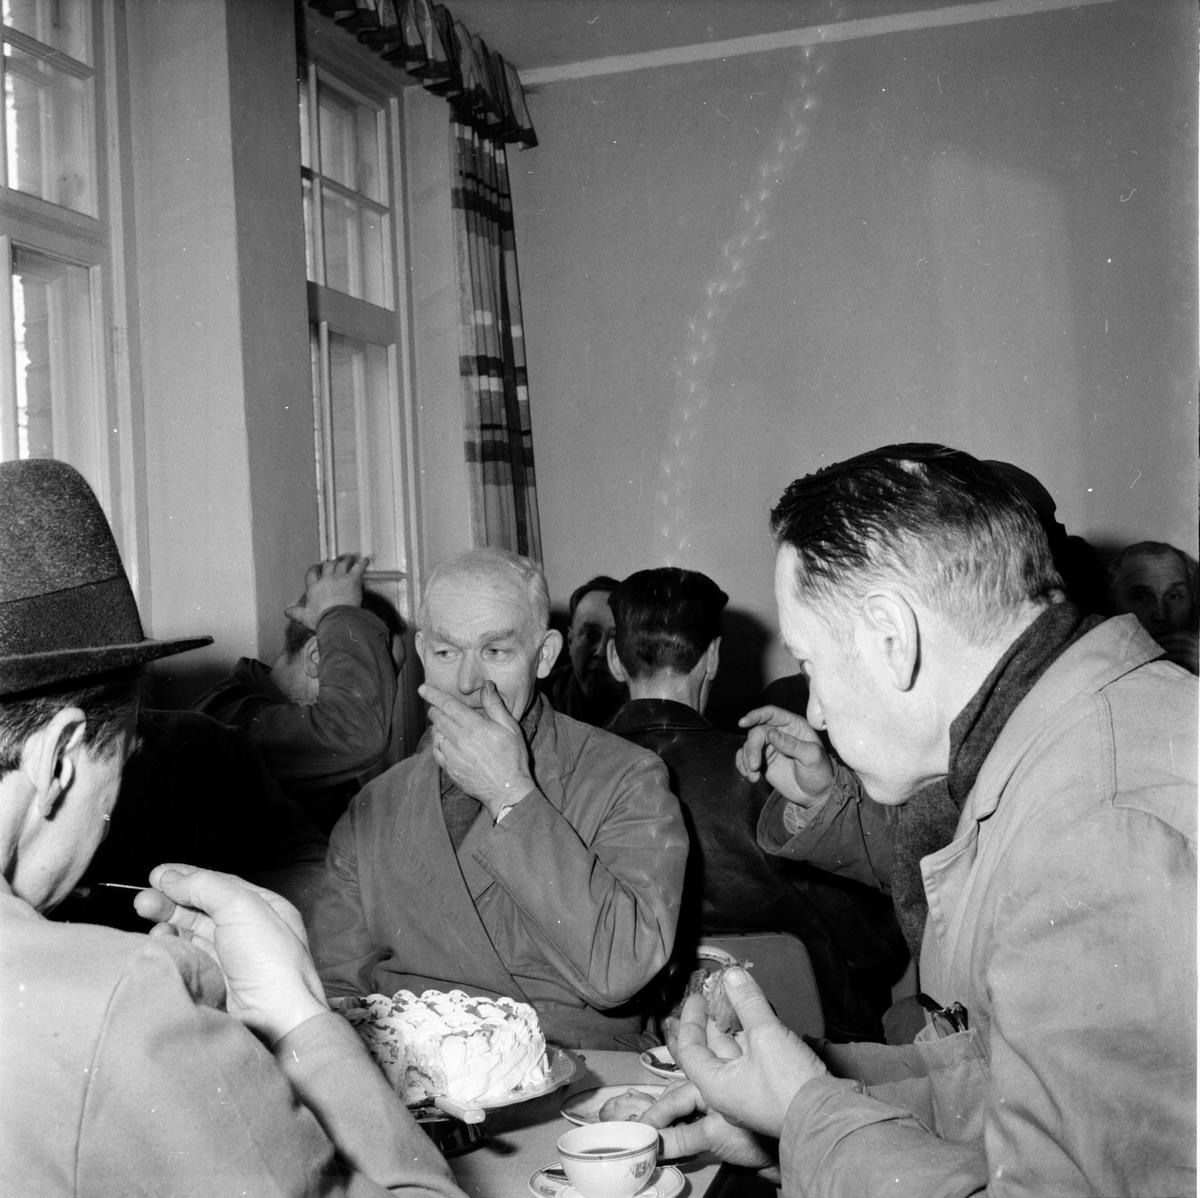 HAKONS sista dag i Bollnäs. 15/3 1963